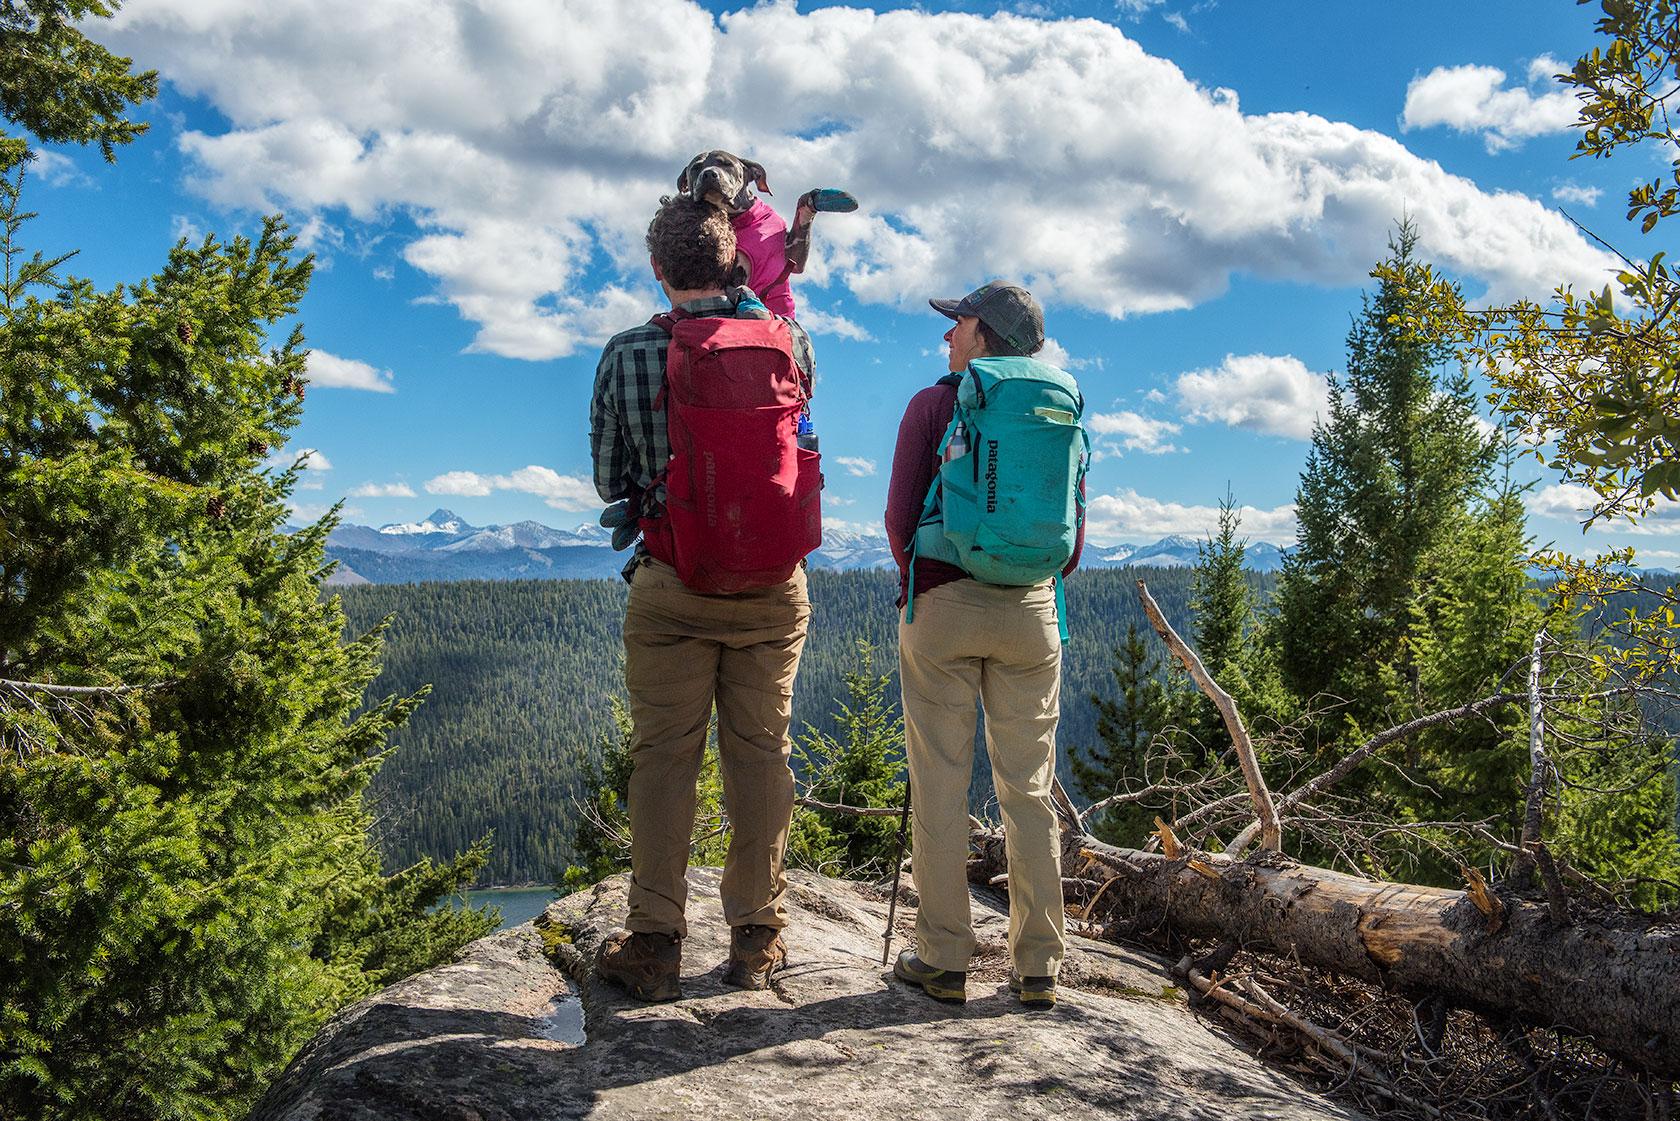 austin-trigg-patagonia-sawtooth-hiking-redfish-lake-dog-advenure-wilderness-forest-idaho-outside-lifestyle-day-fall-weather-mountains.jpg